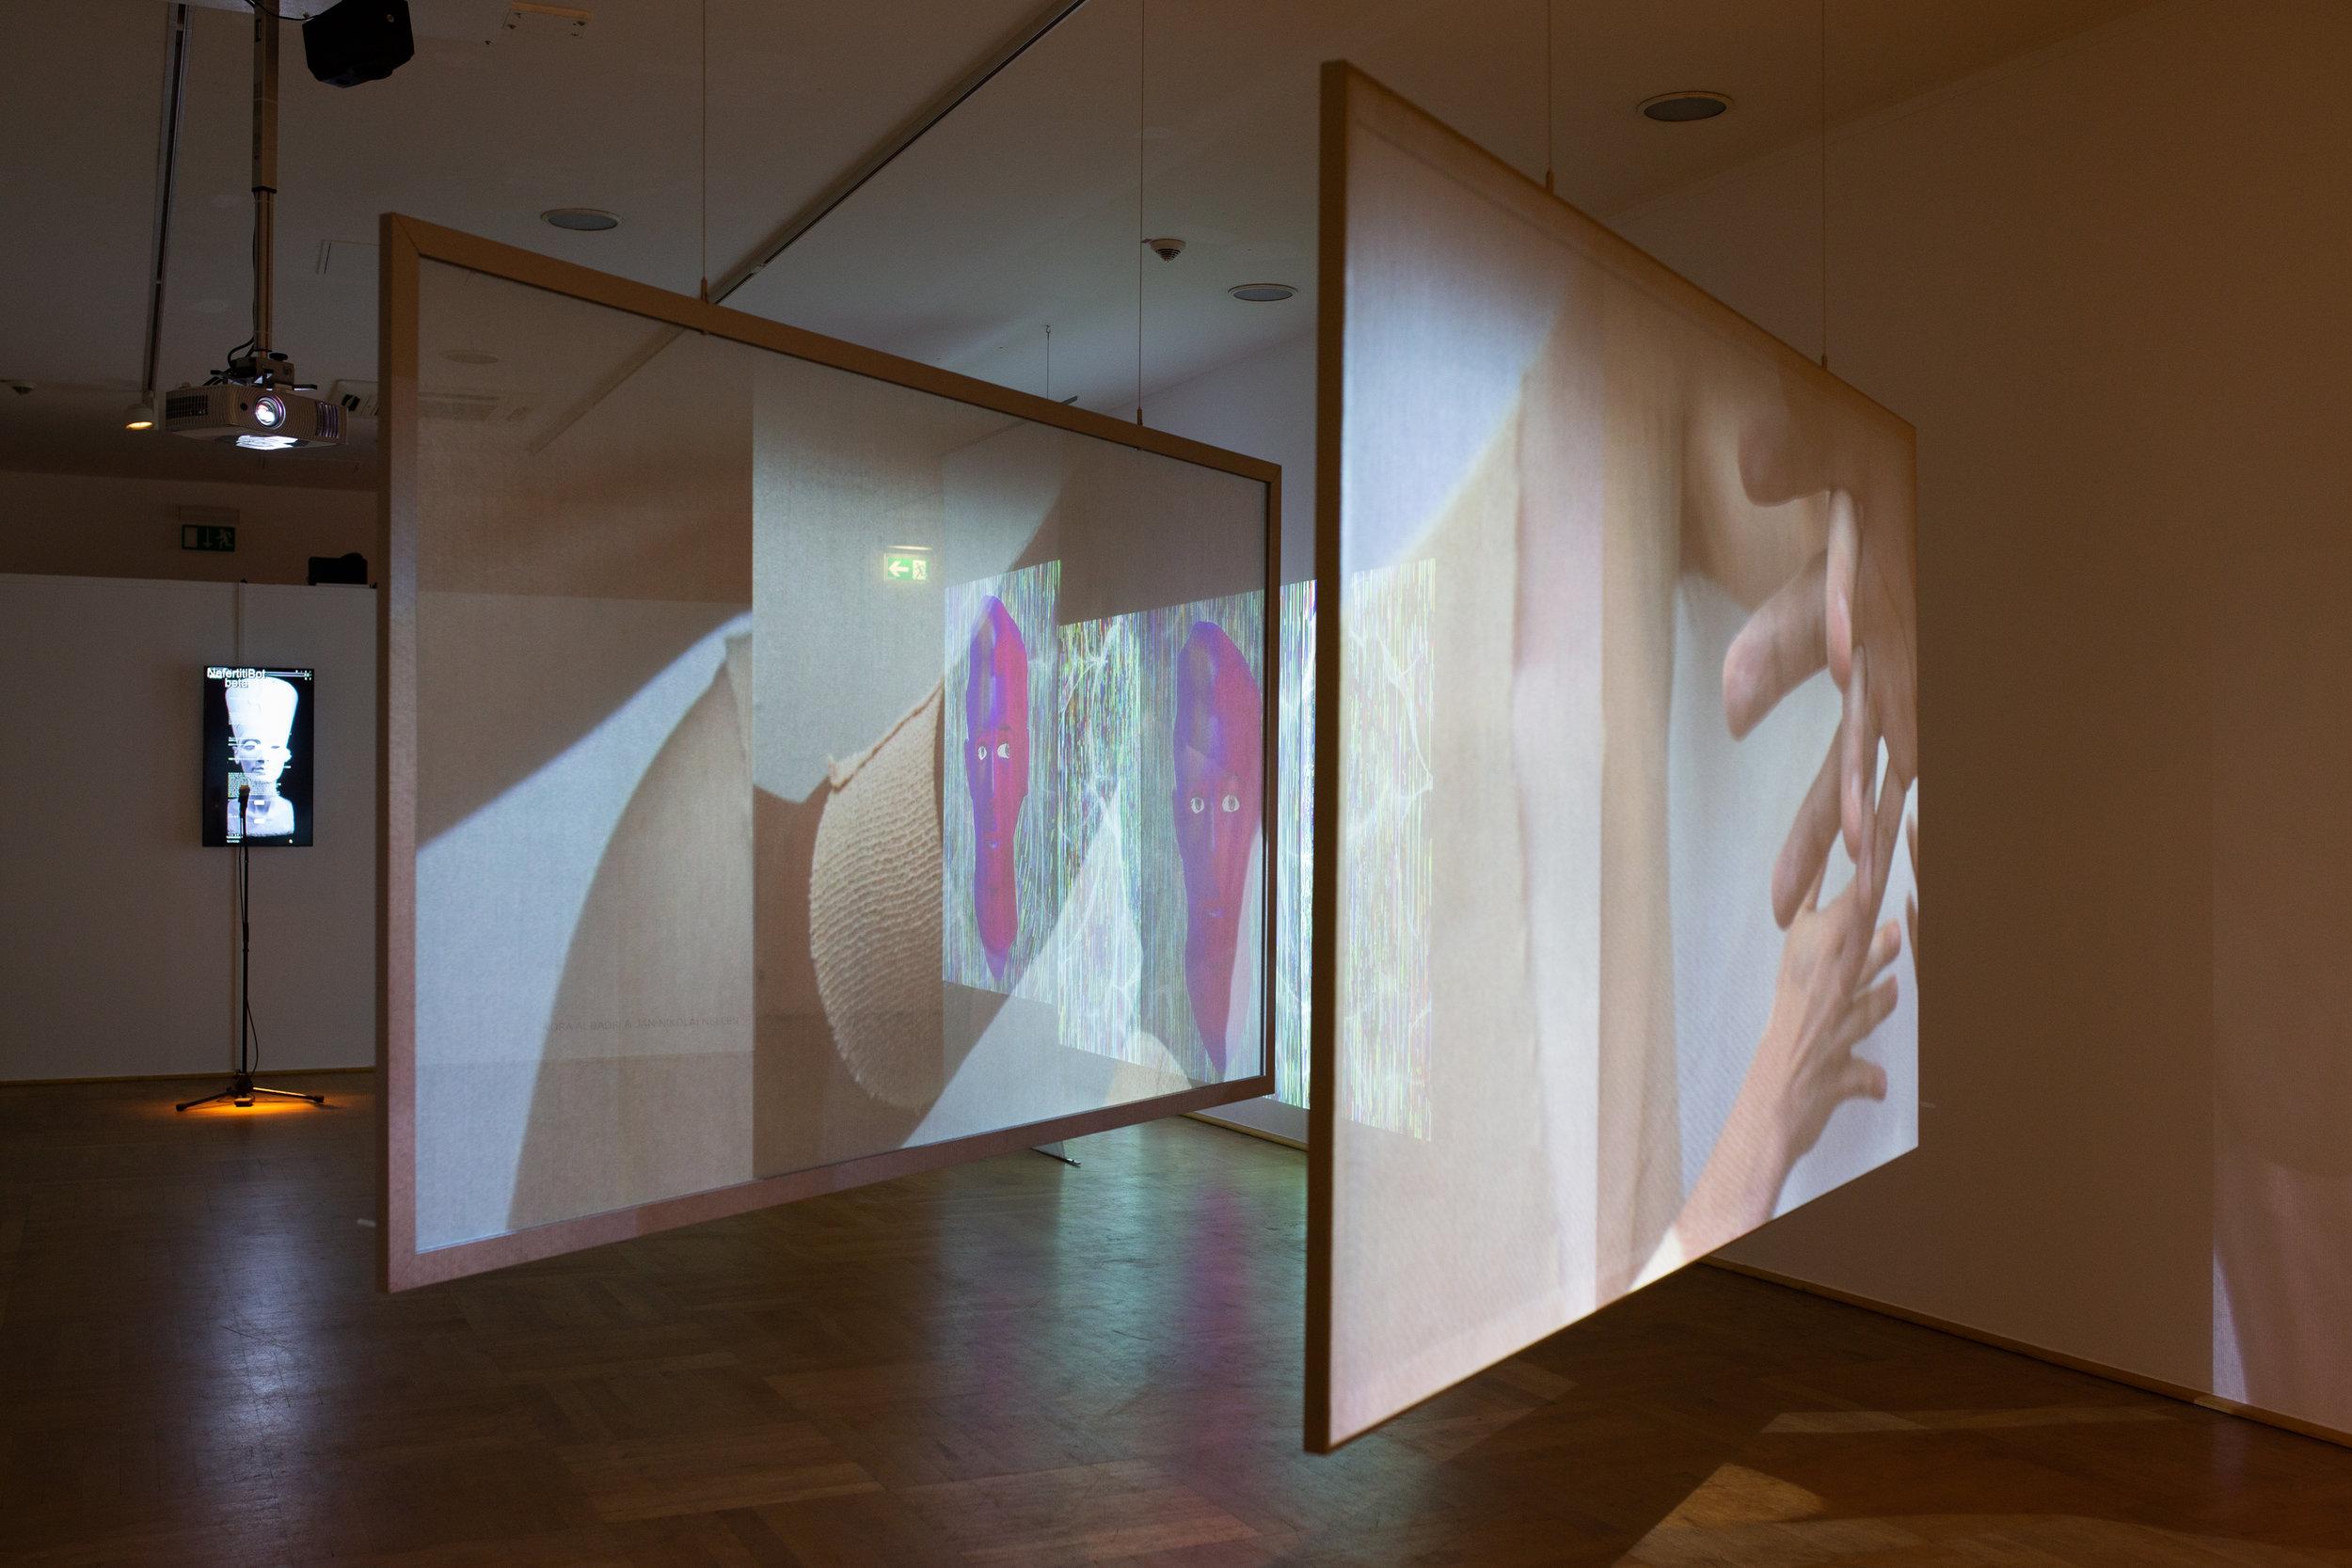 Exhibition view with works by Tuomas A. Laitinen, Nora Al-Badri & Jan-Nikolai Nelles, Jonas Blume, photo © NRW-Forum Düsseldorf / Bozica Babic